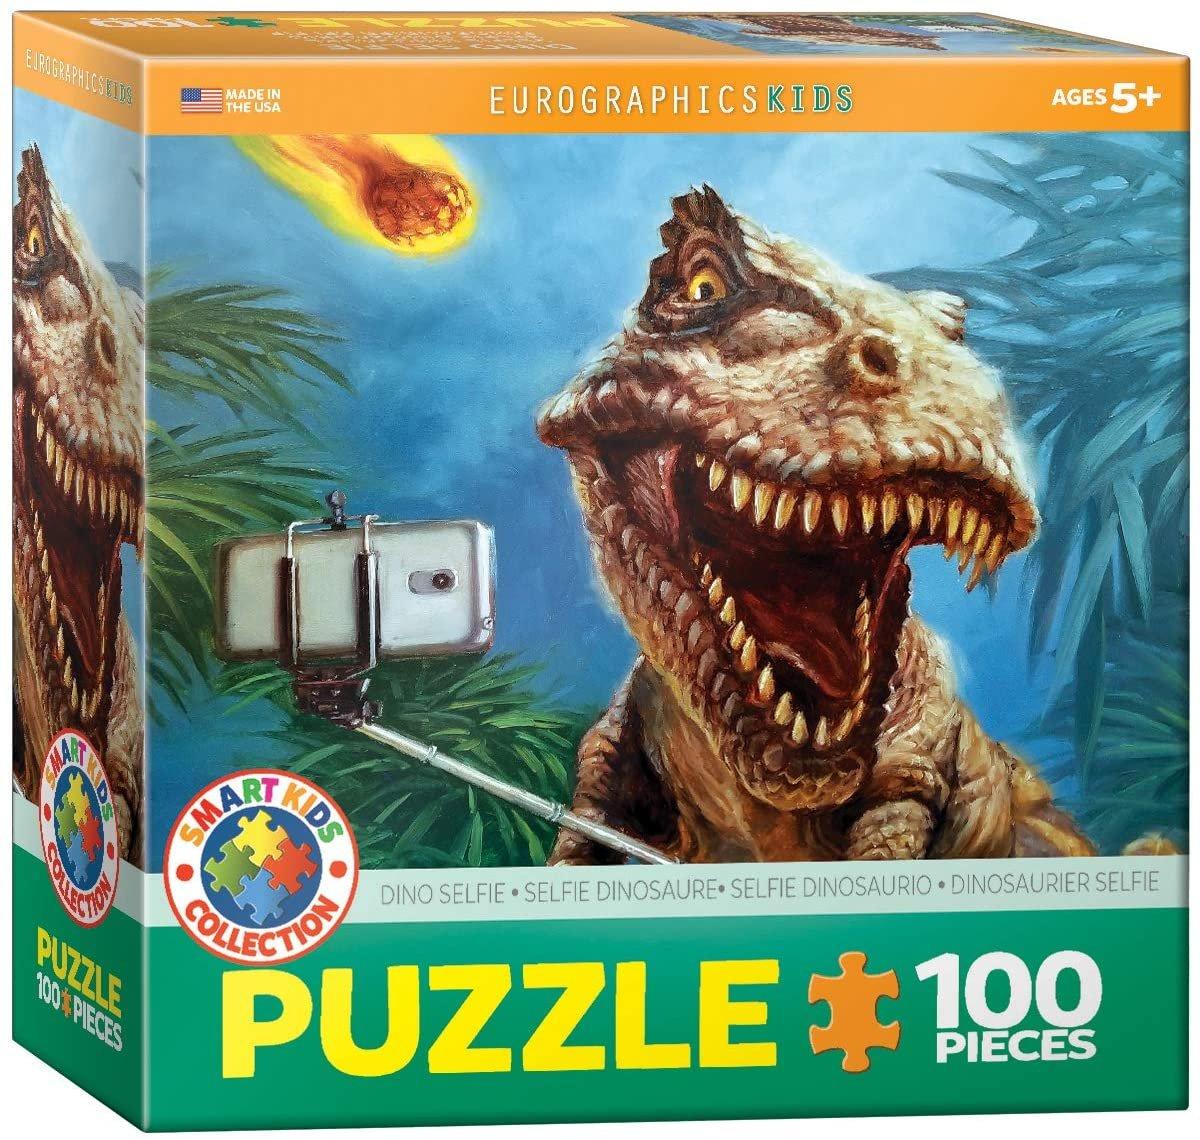 Eurographics 100 Piece Dinosaur Puzzle